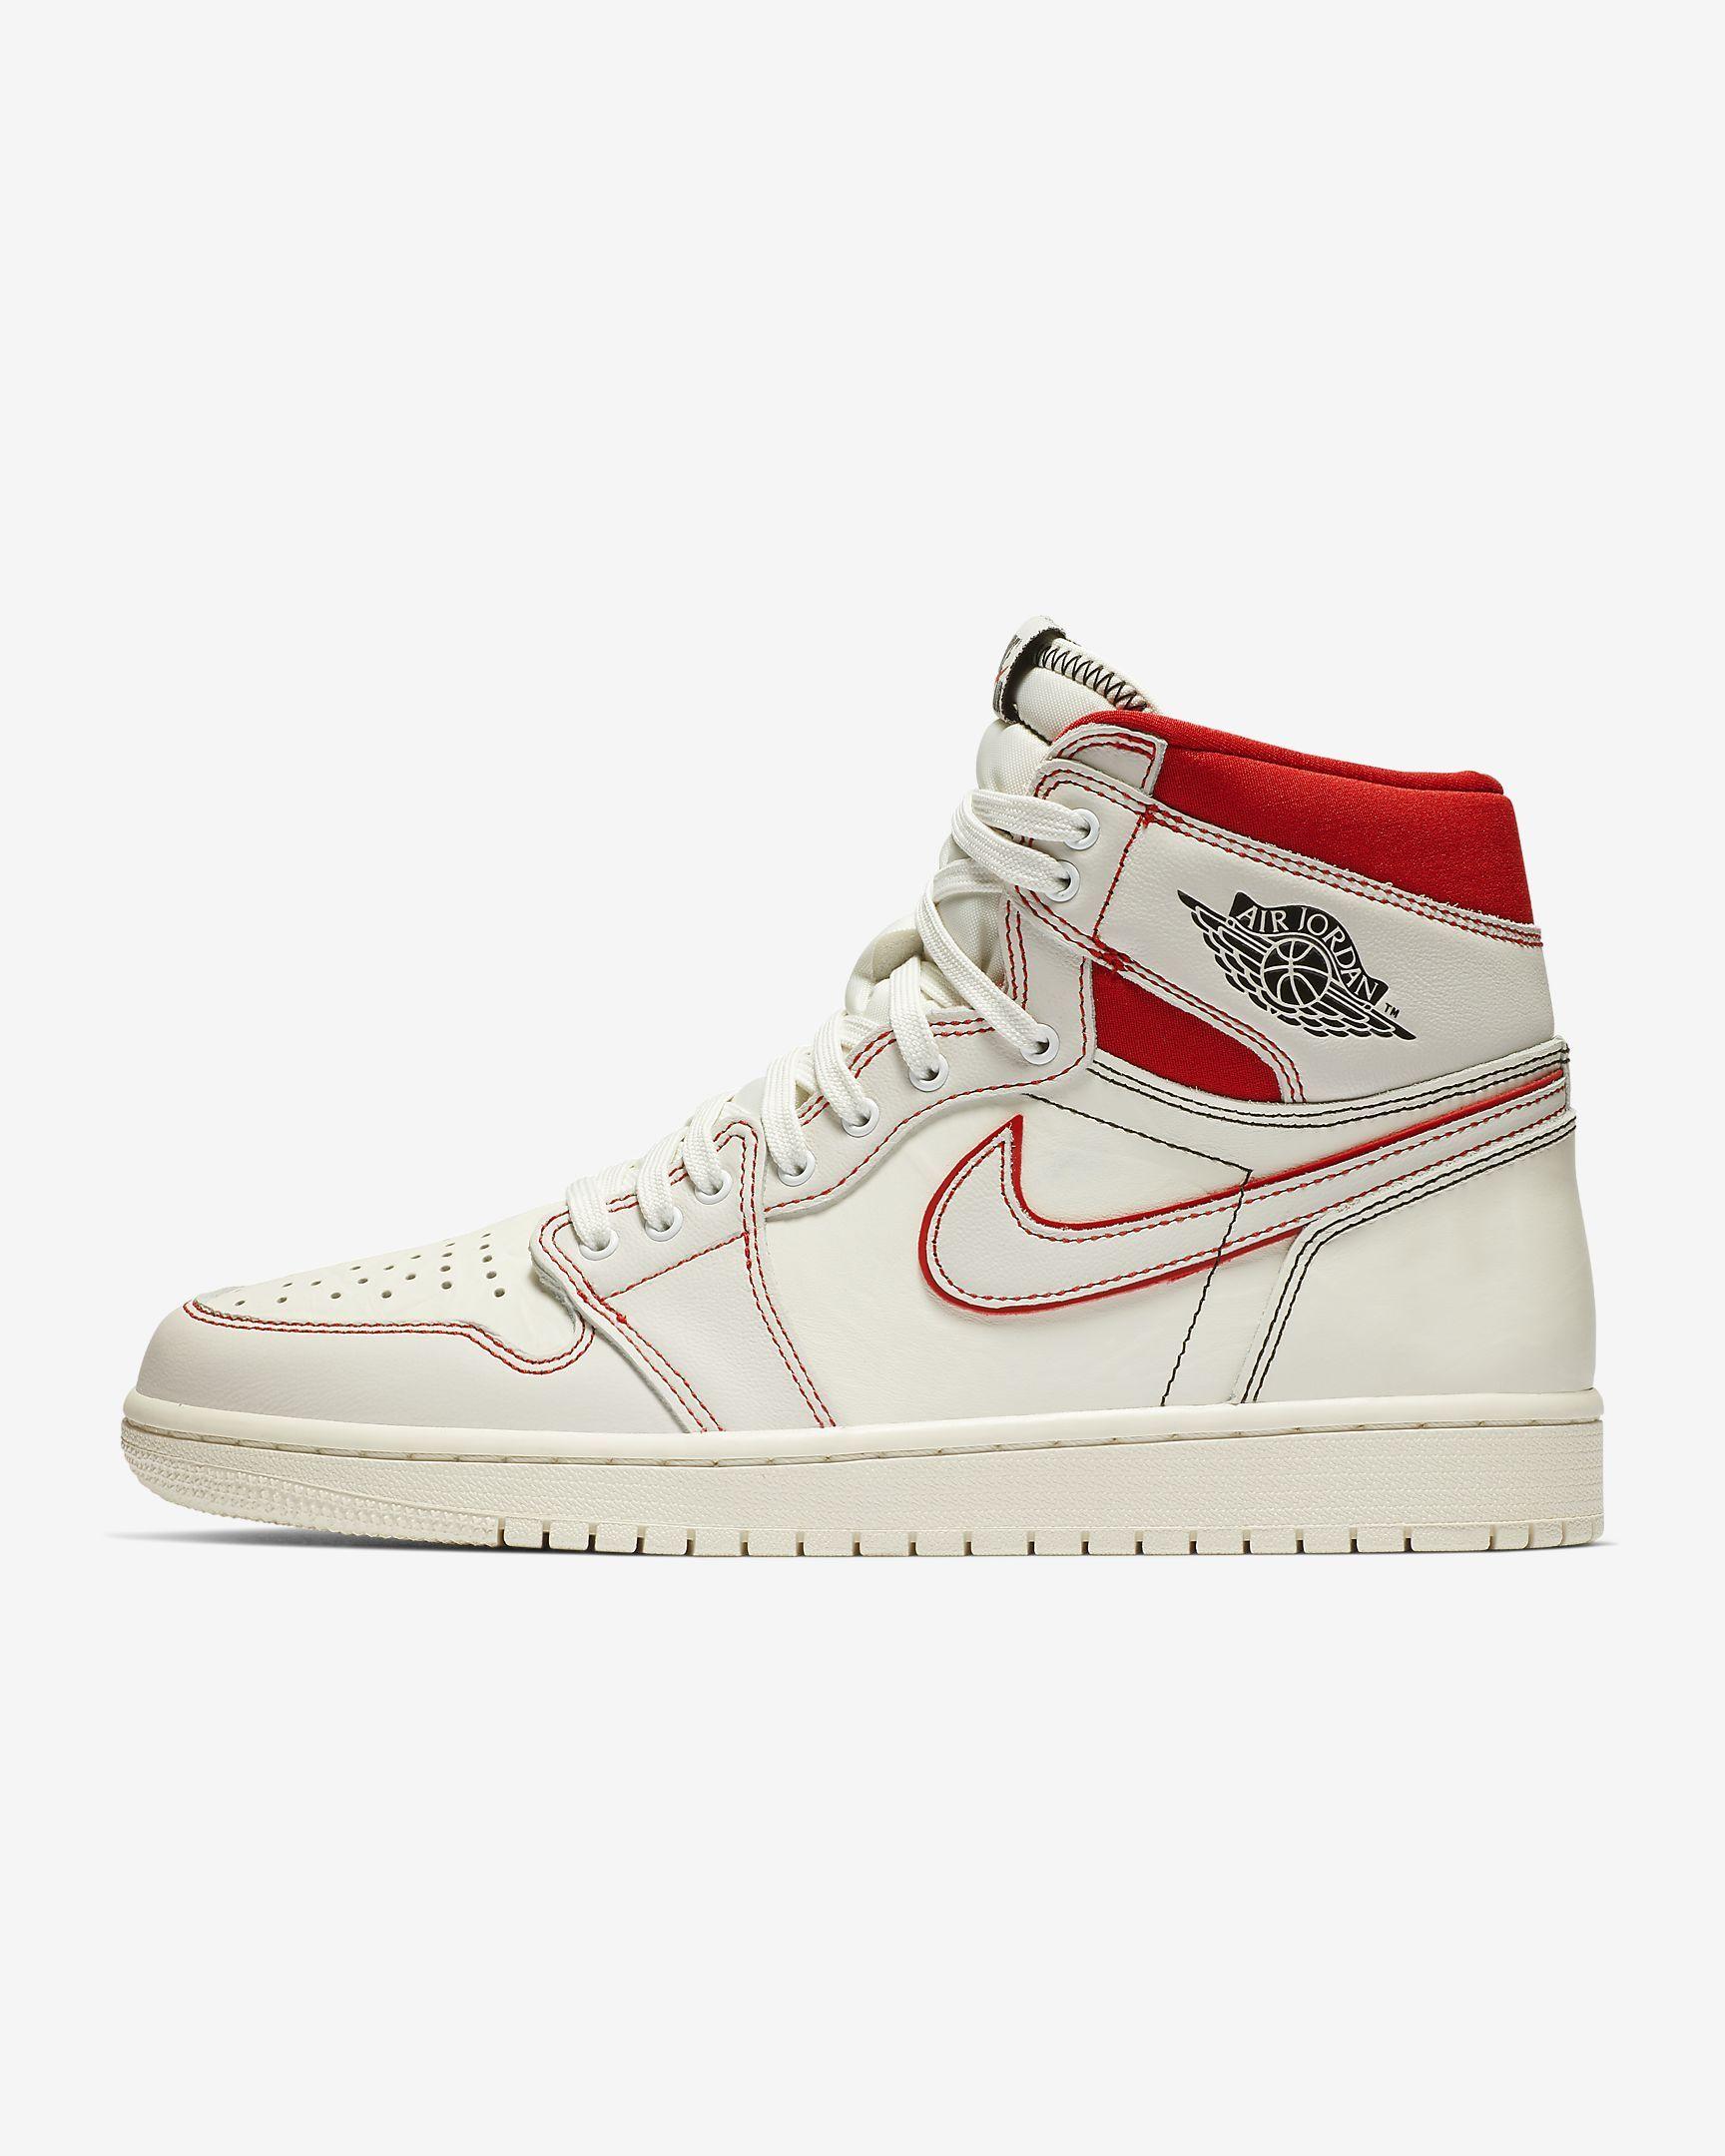 Air Jordan 1 Retro High Og Shoe Nike Com Air Jordans Jordan 1